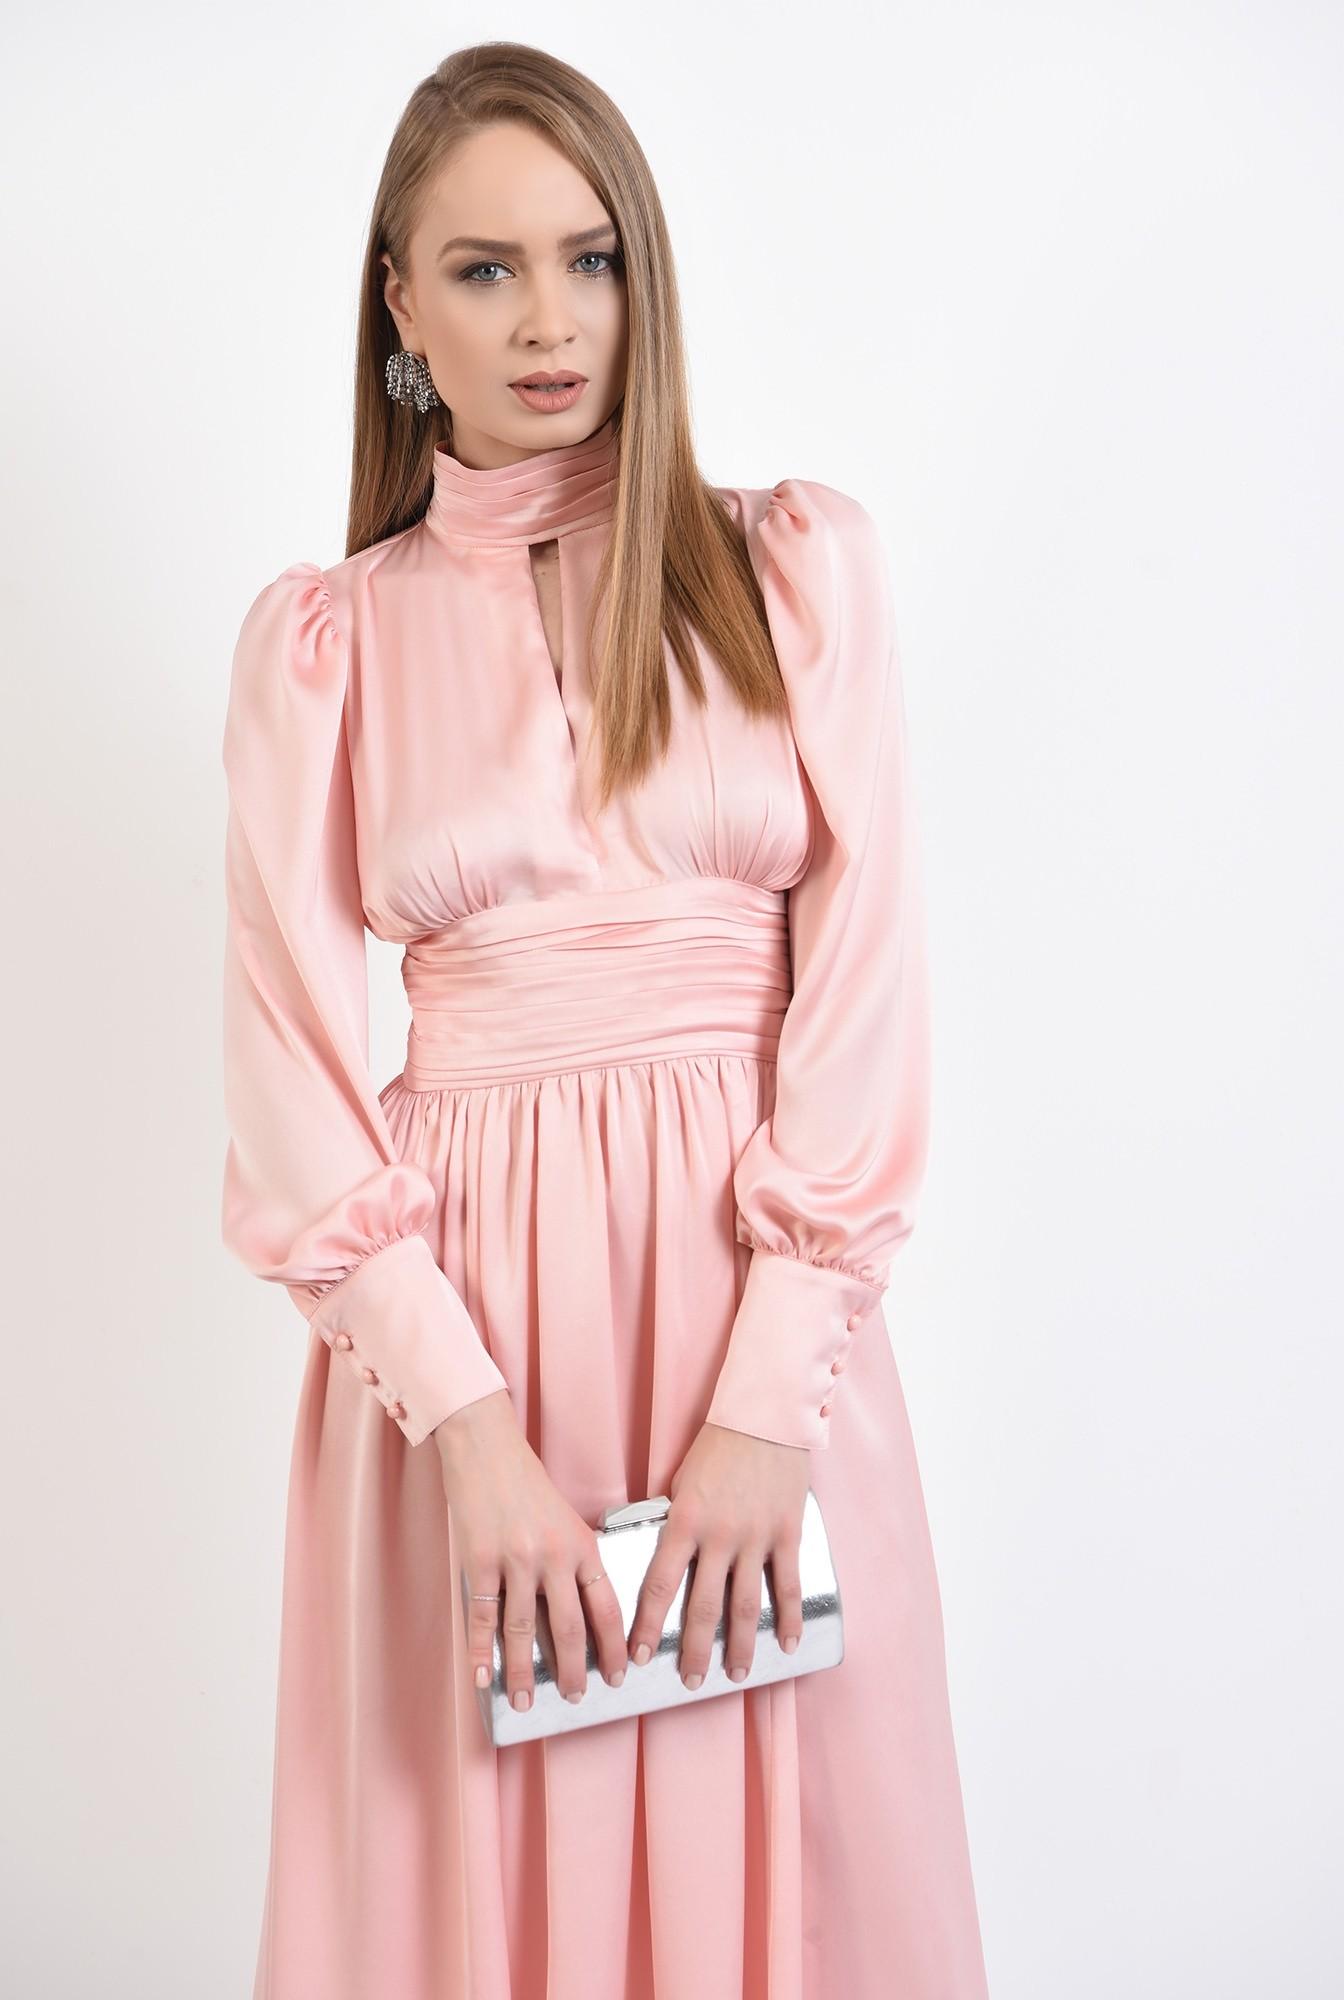 0 - 360 - rochie eleganta, din satin, evazata, midi, brau fronsat, roz